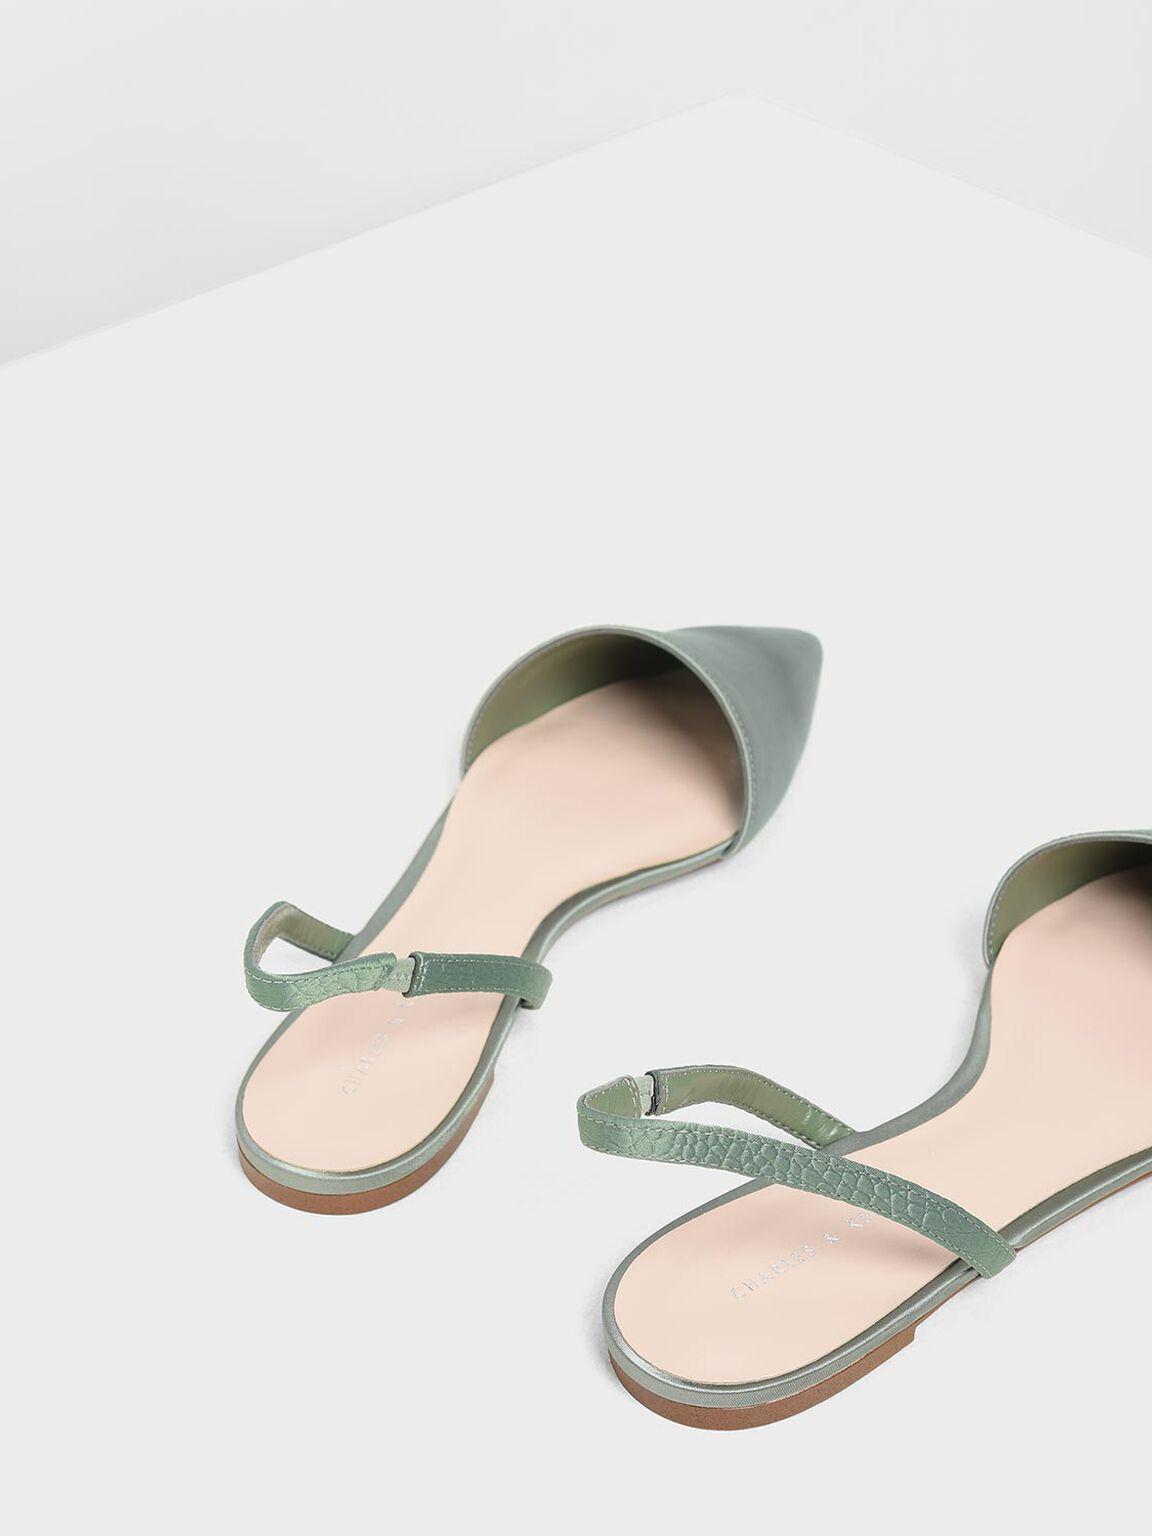 Satin Pointed Toe Slingback Flats, Green, hi-res